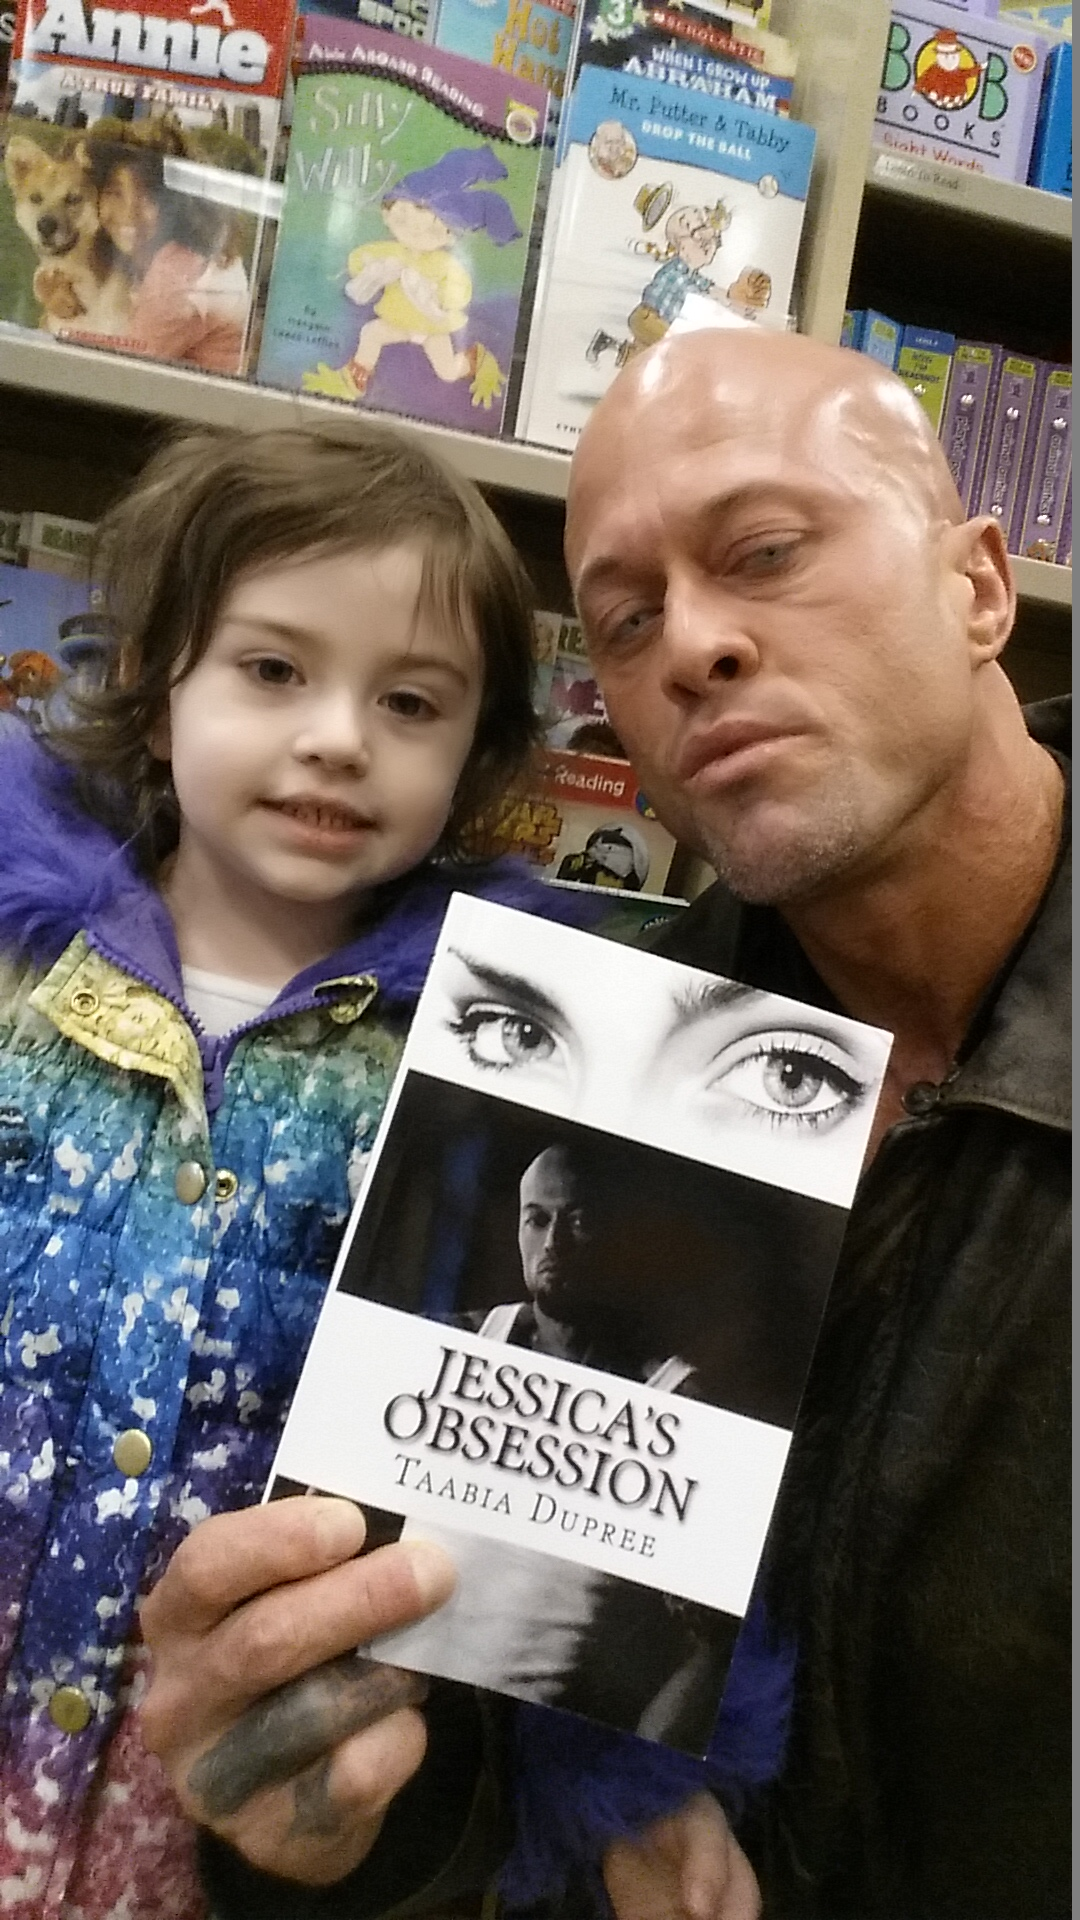 Celebrity Tattoo Romance Model John Joseph Quinlan in Barnes & Noble with Daughter Mia Grace 2-2015. #JohnQuinlan